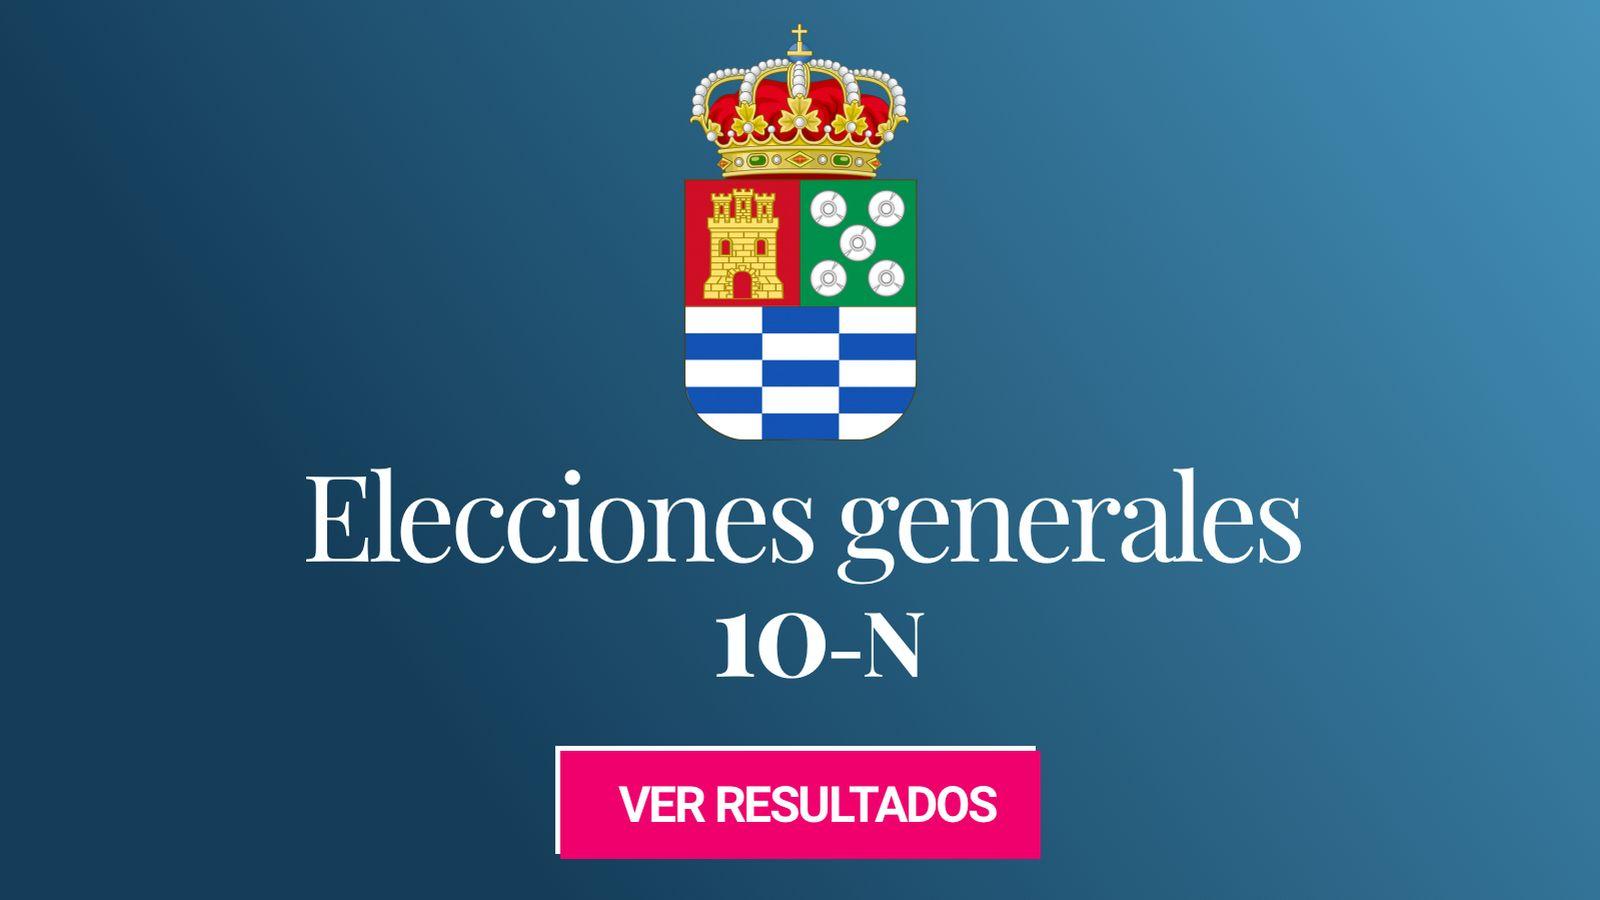 Foto: Elecciones generales 2019 en Molina de Segura. (C.C./EC)